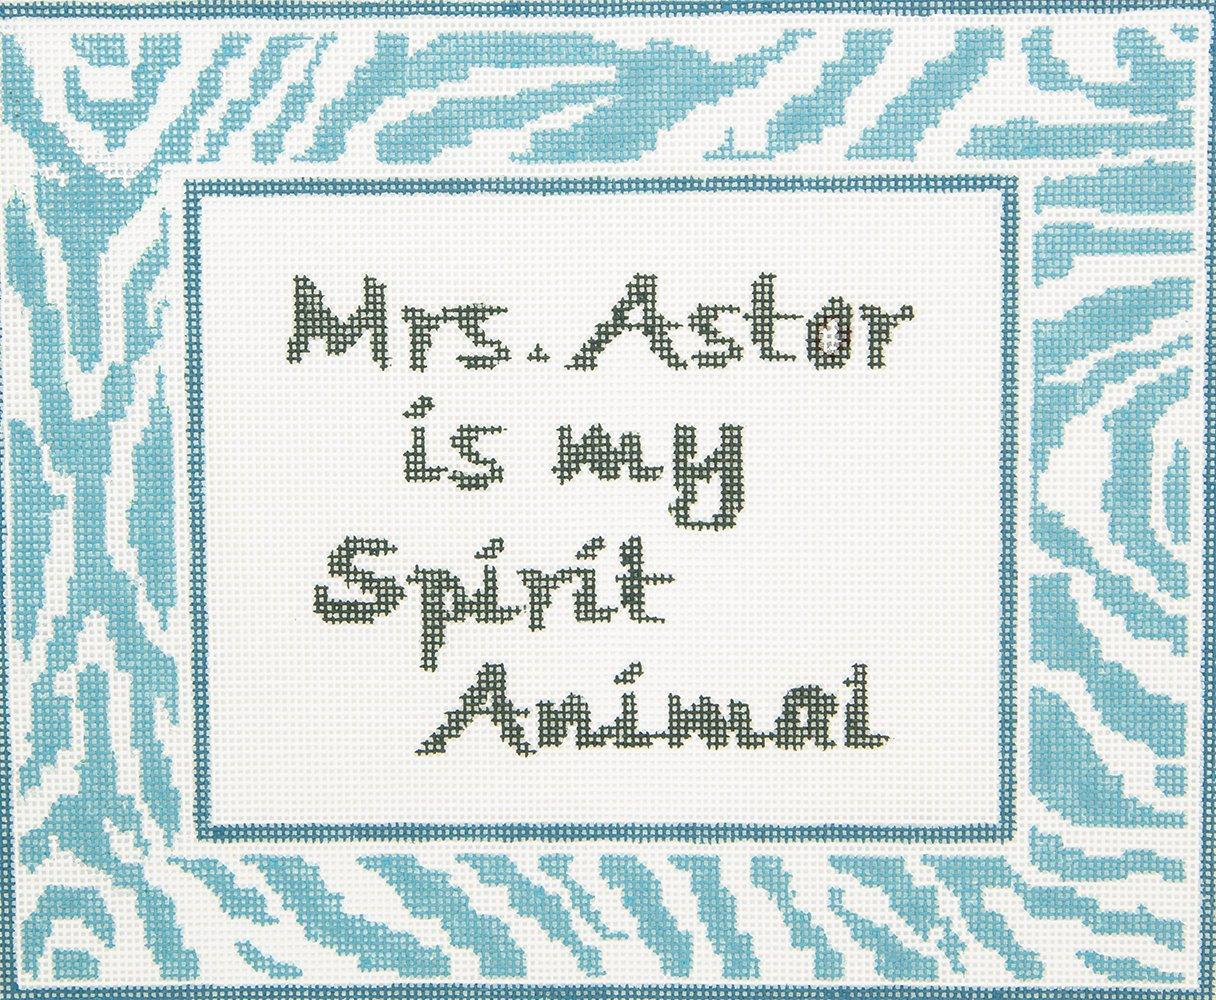 HSNPIL03 Mrs. Astor HSN Designs